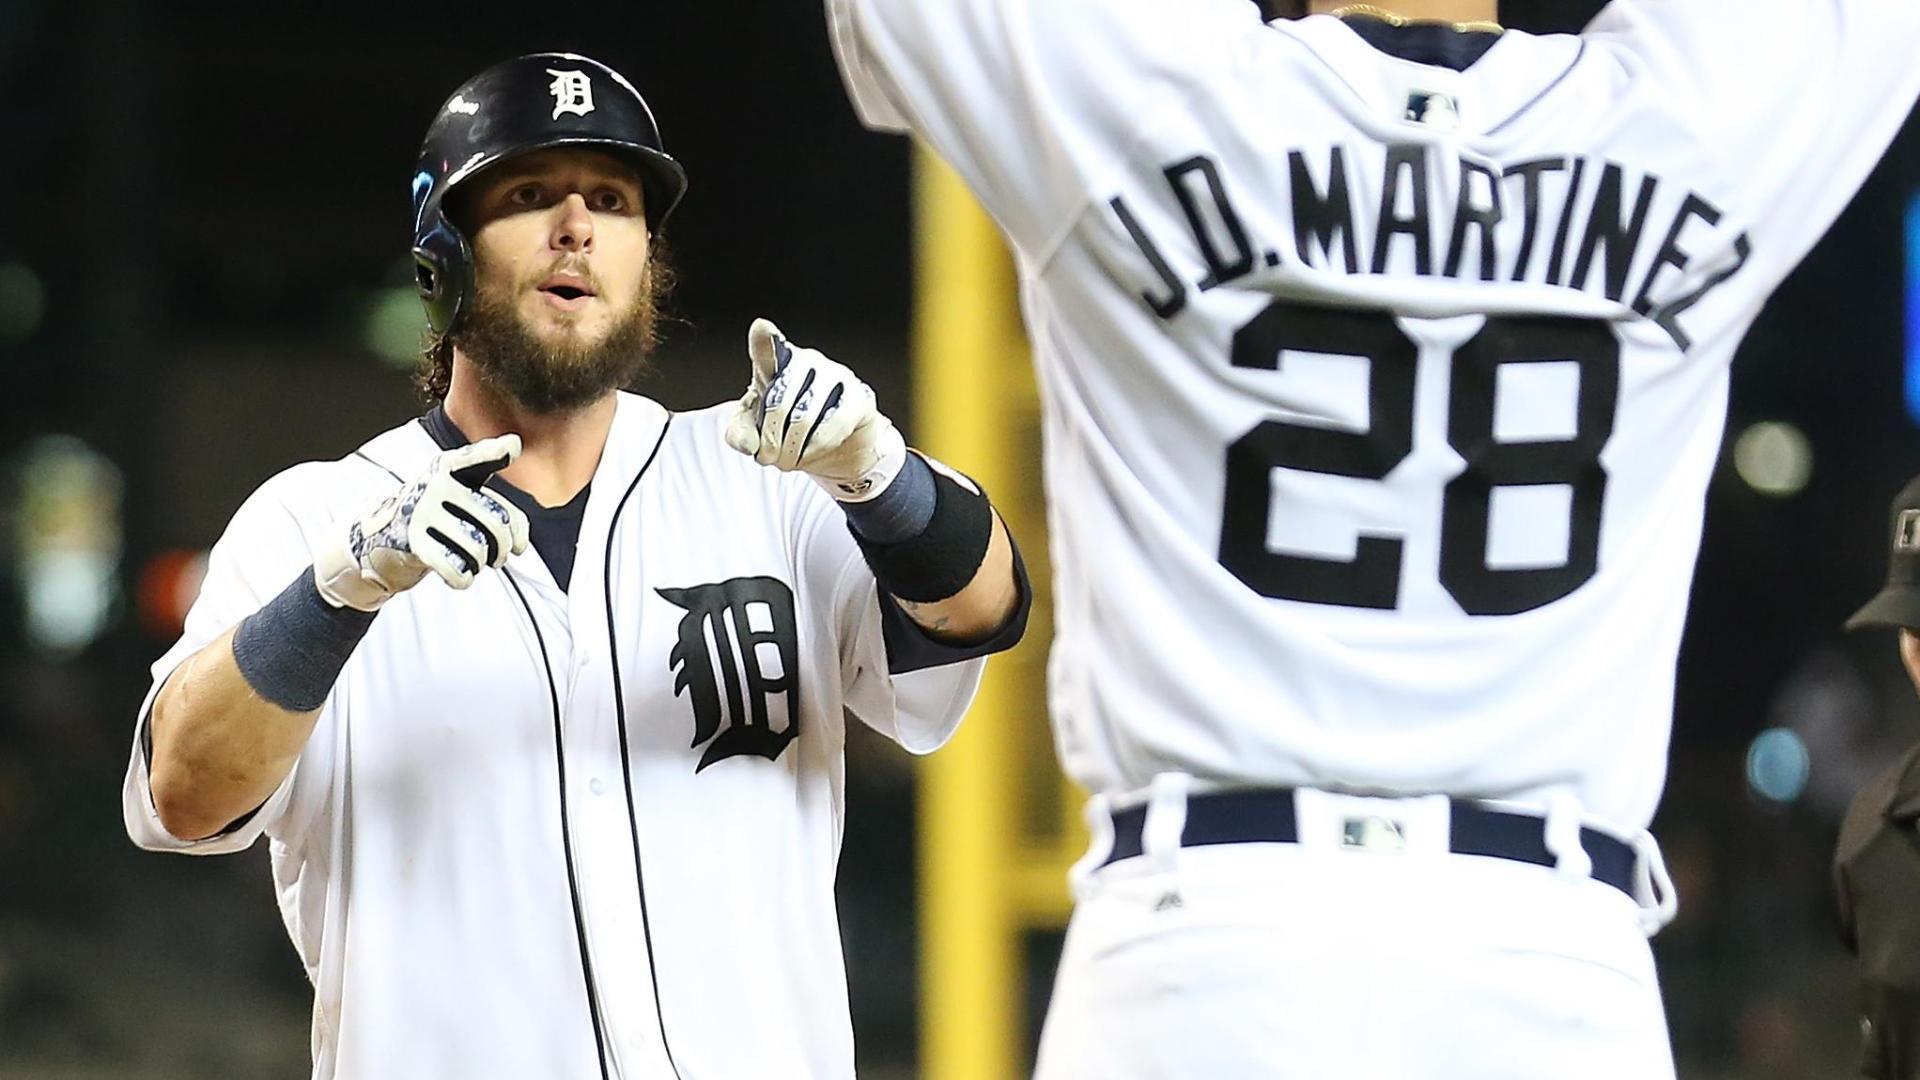 Saltalamacchia's two-run blast wins game for Tigers